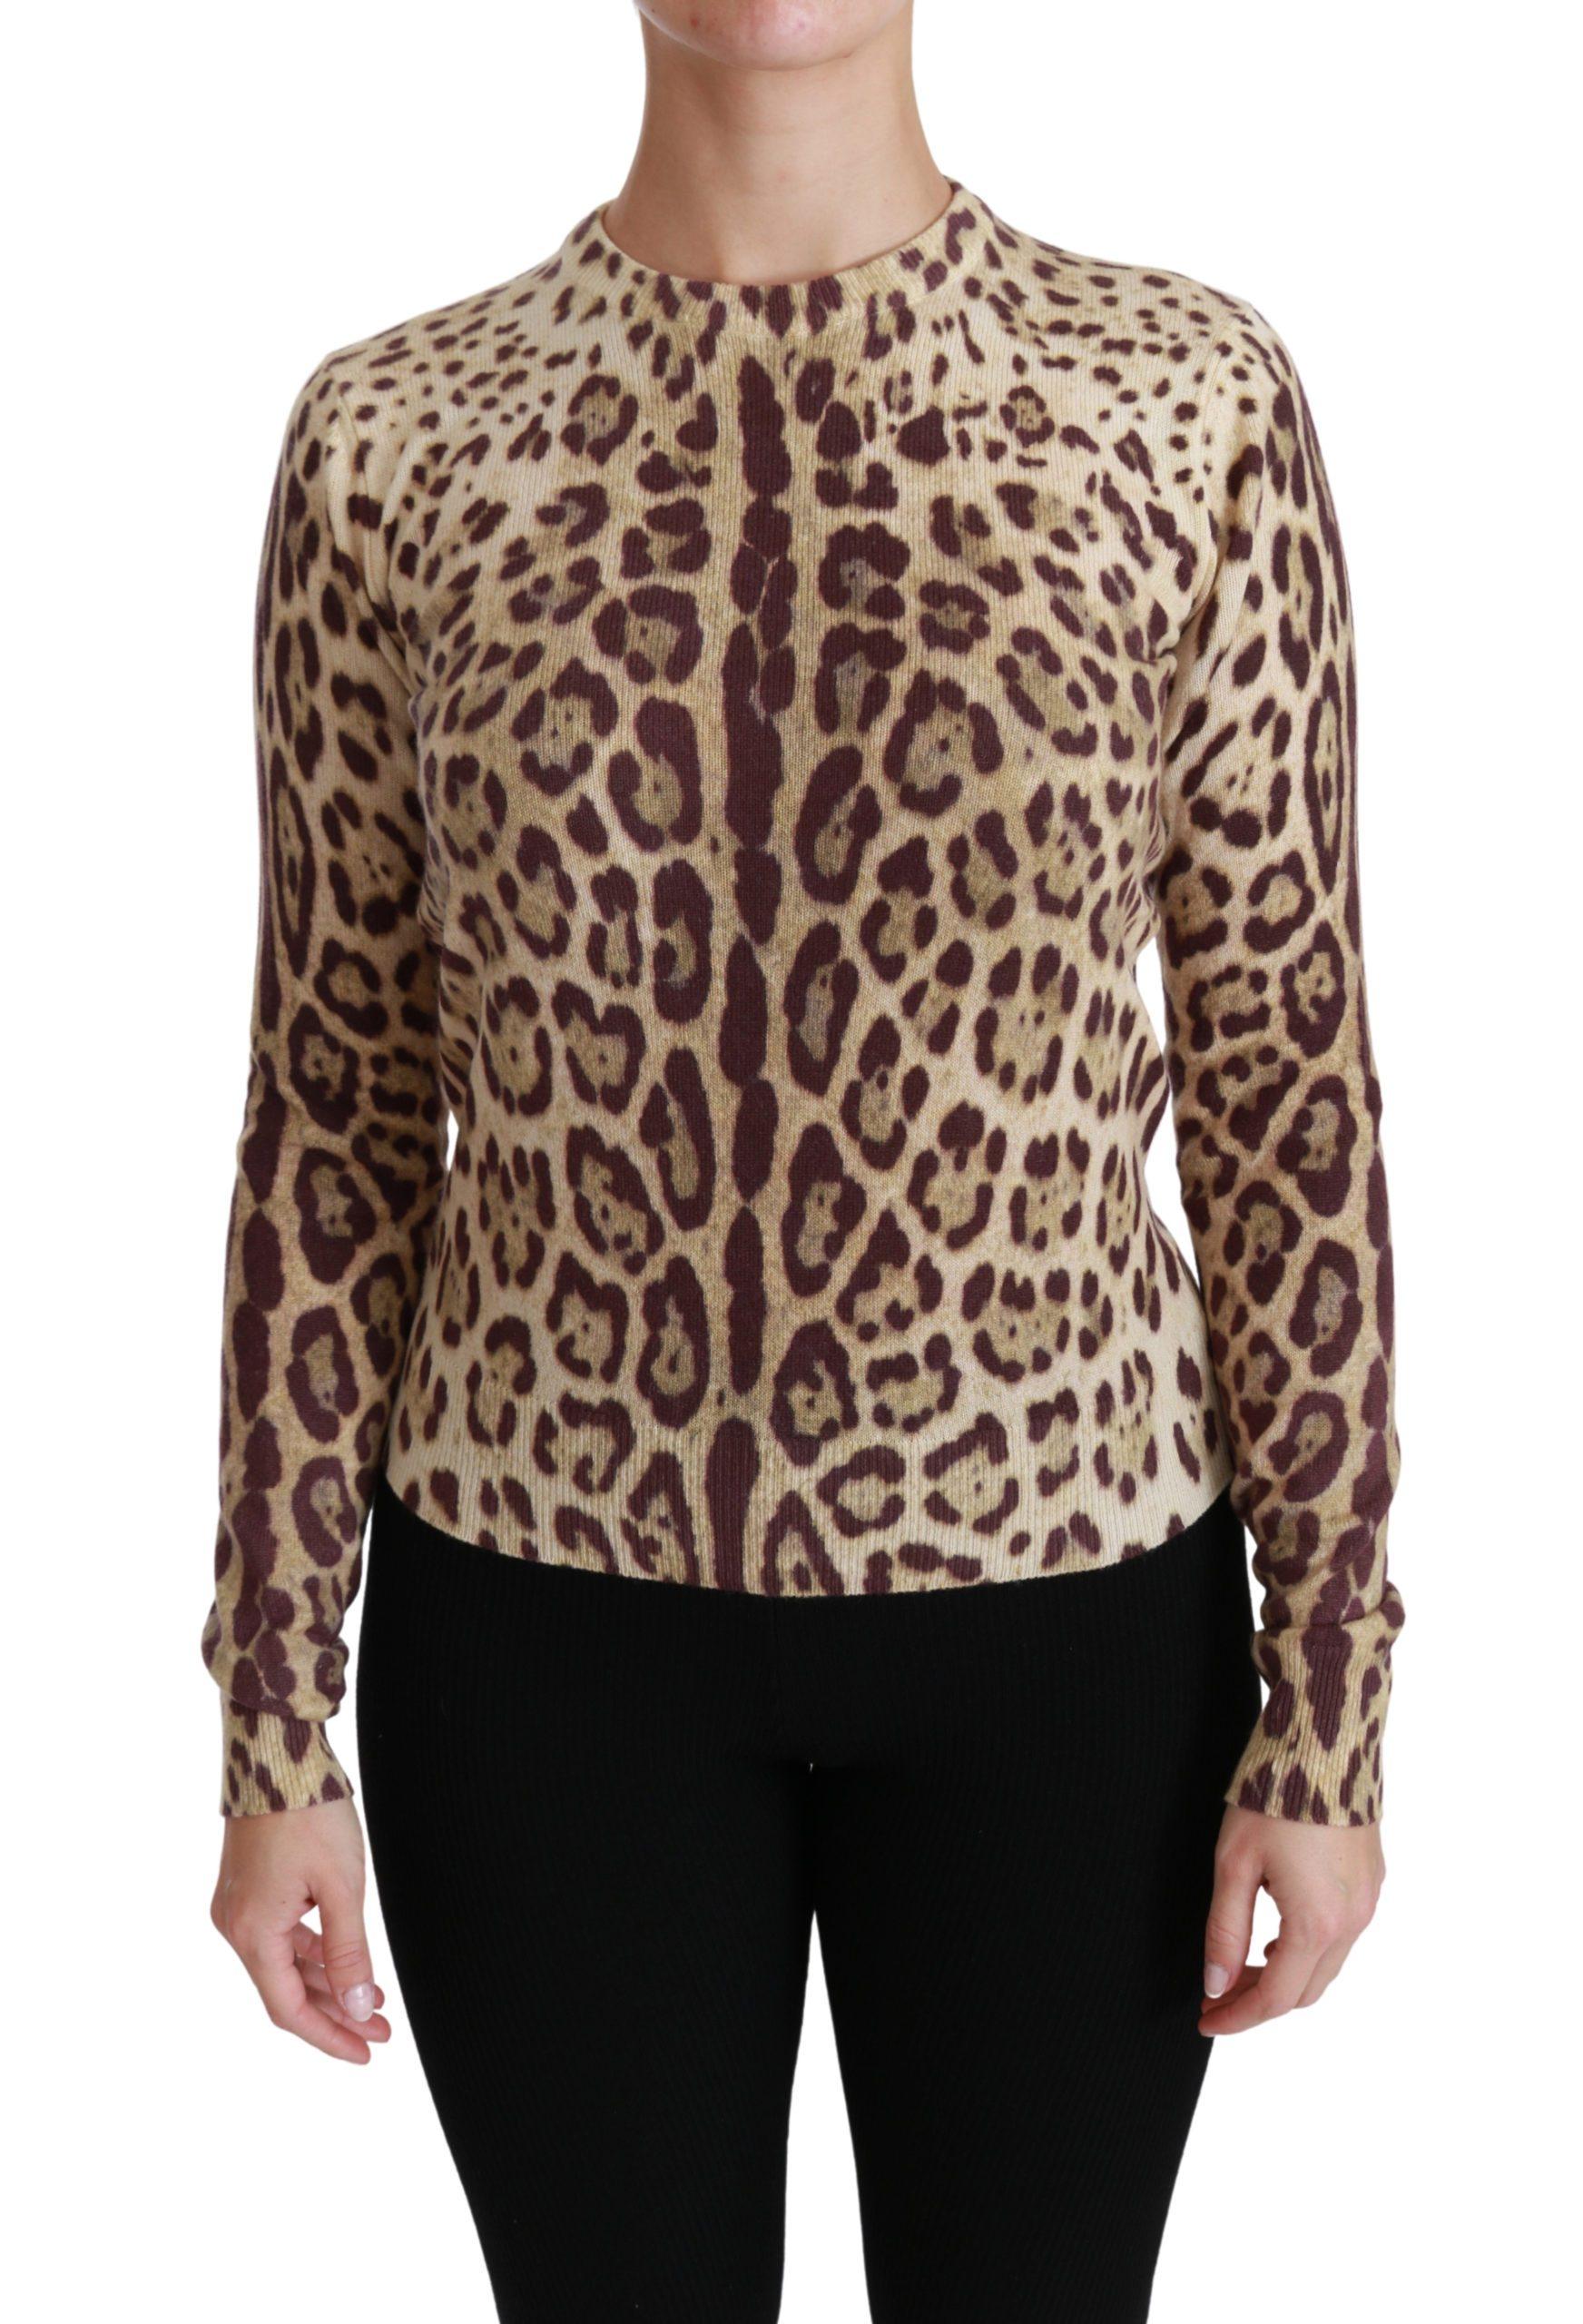 Dolce & Gabbana Women's Leopard LS Cashmere Sweater Brown TSH4426 - IT36 | XS